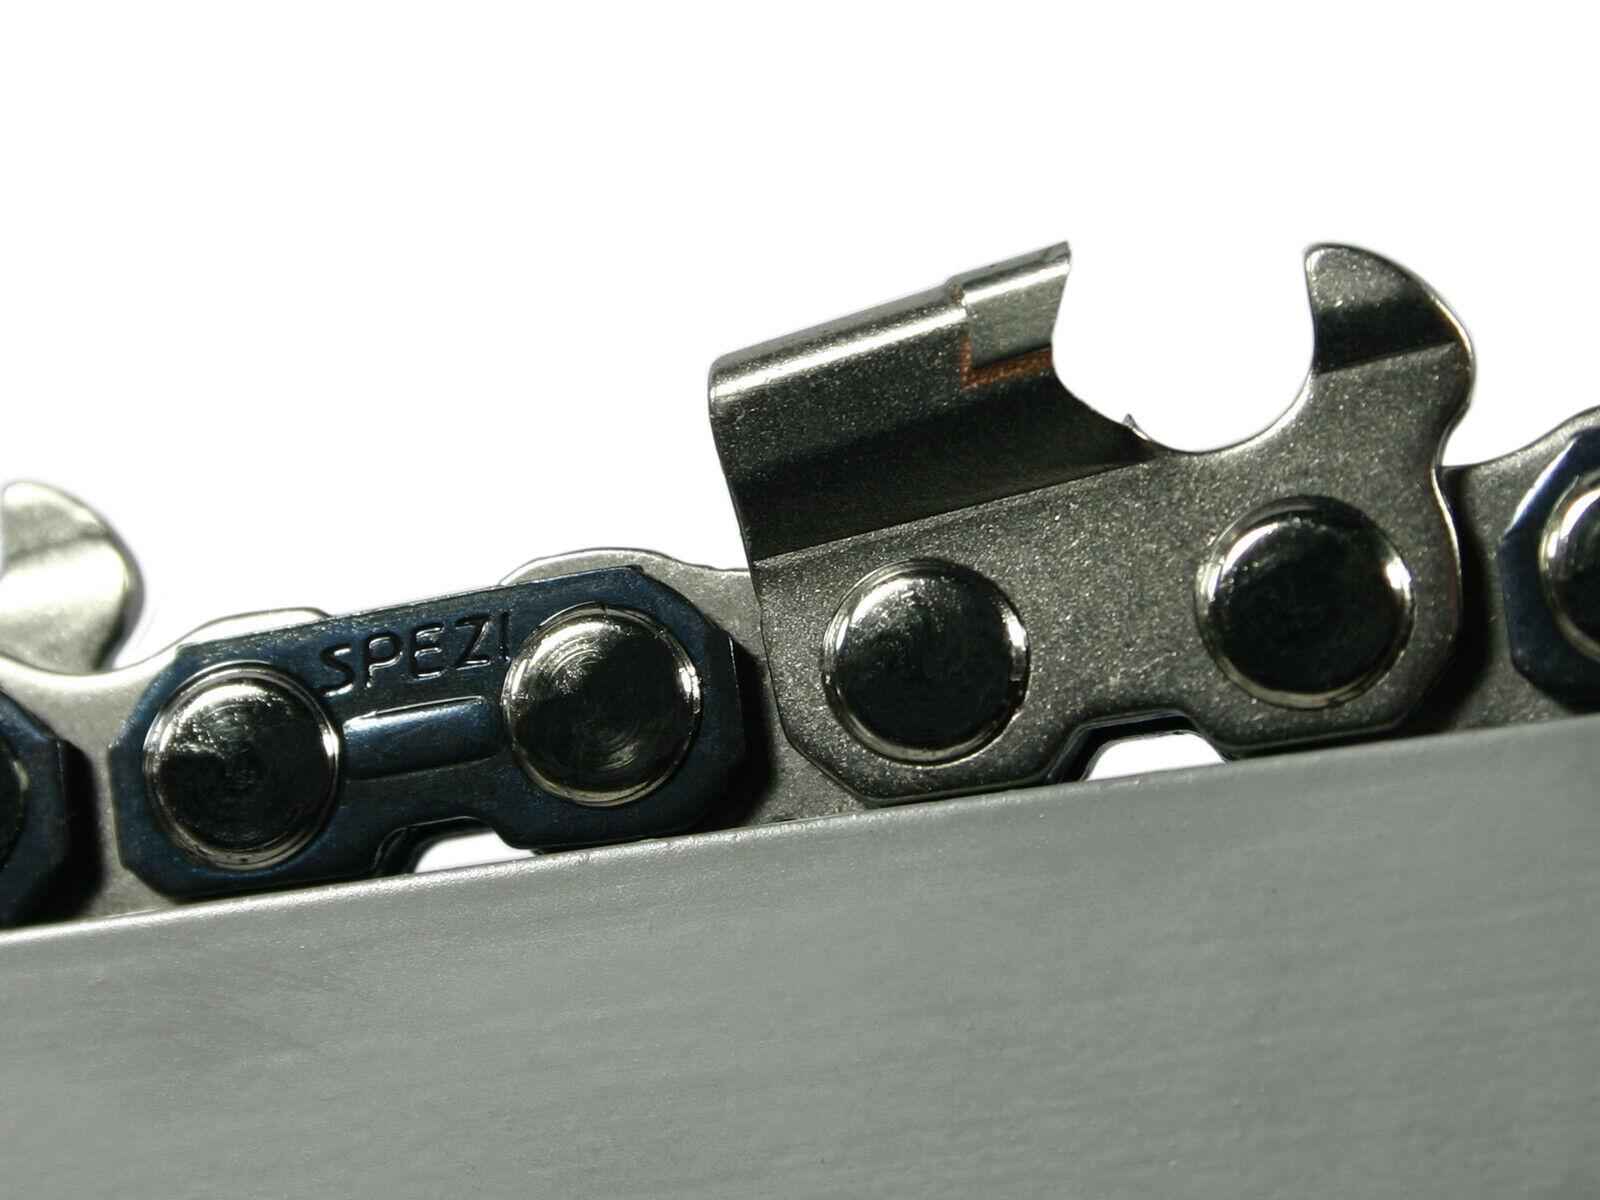 Metal duro cadena sierra adecuado para Husqvarna 272 75 cm 3 8  98 TG 1,5 mm Cochebide